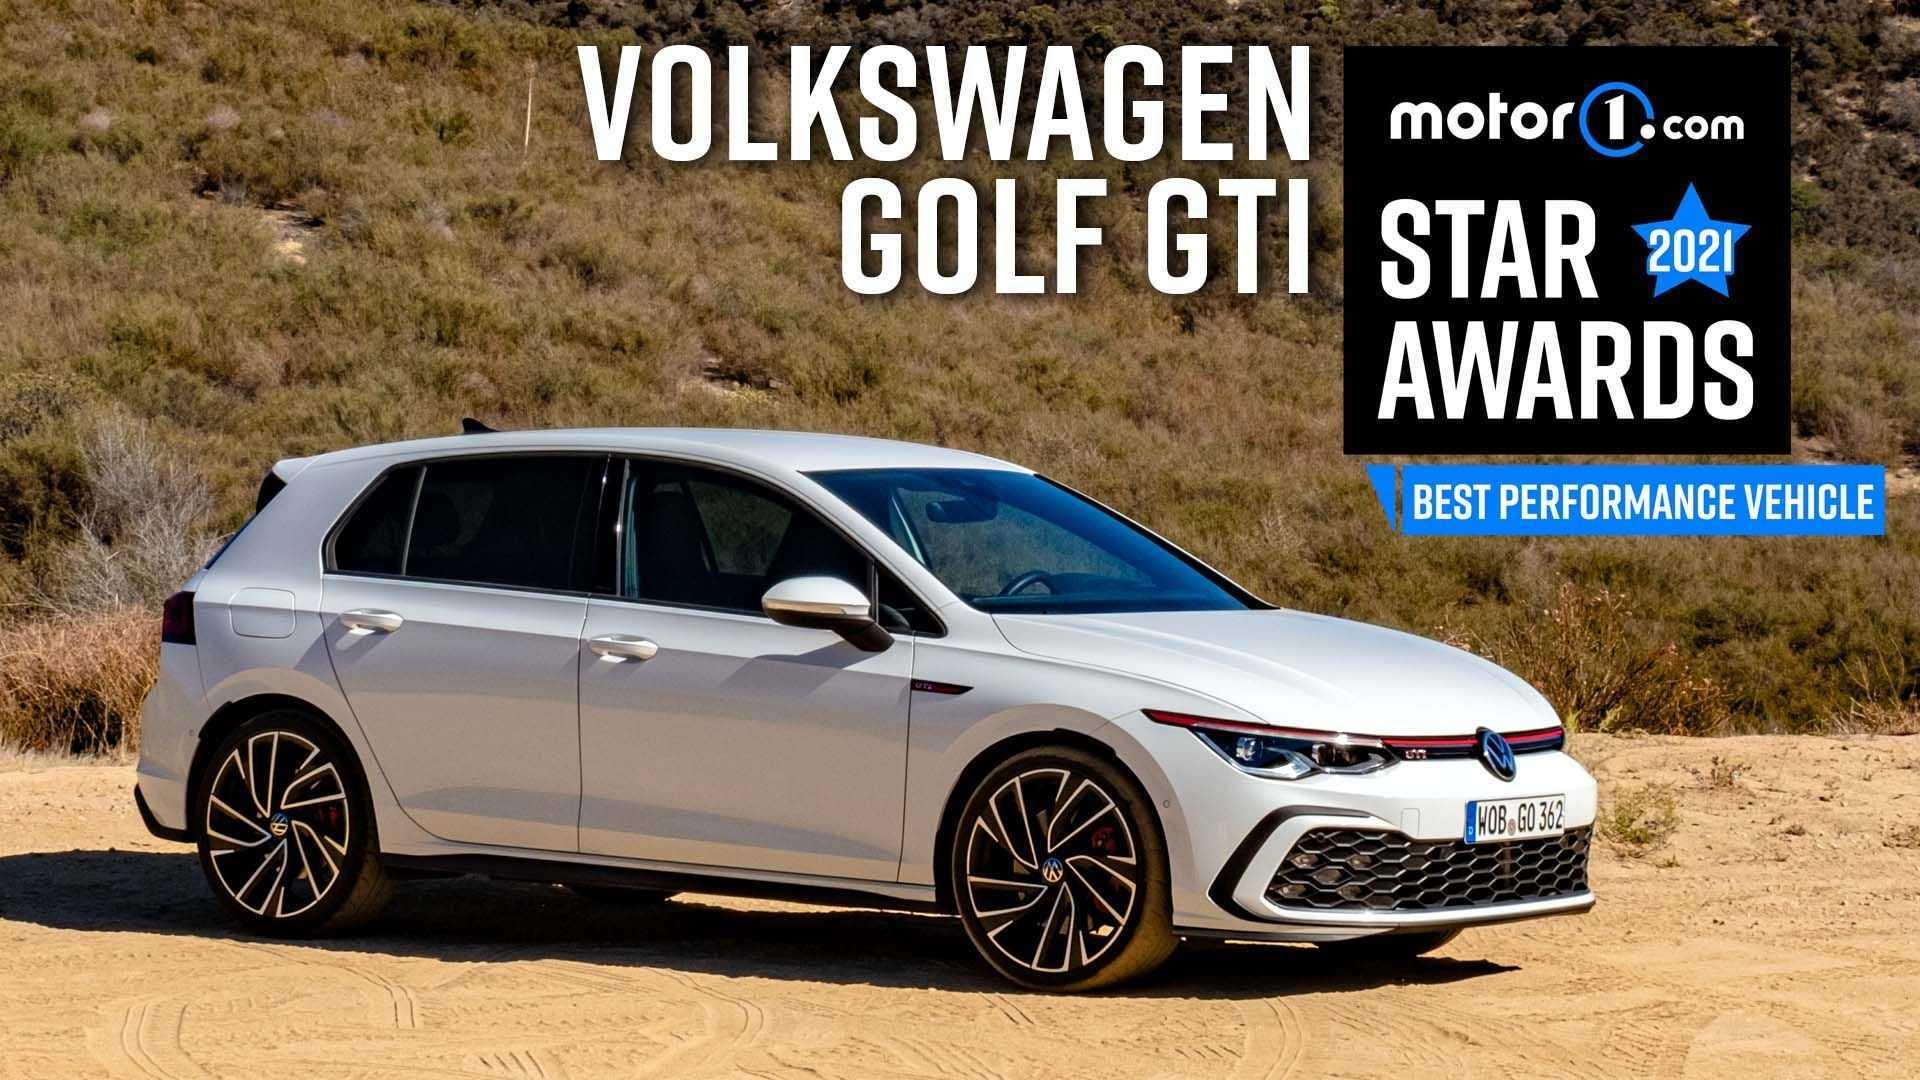 2022 Volkswagen GTI Wins Motor1 Star Award For Best Performance Vehicle